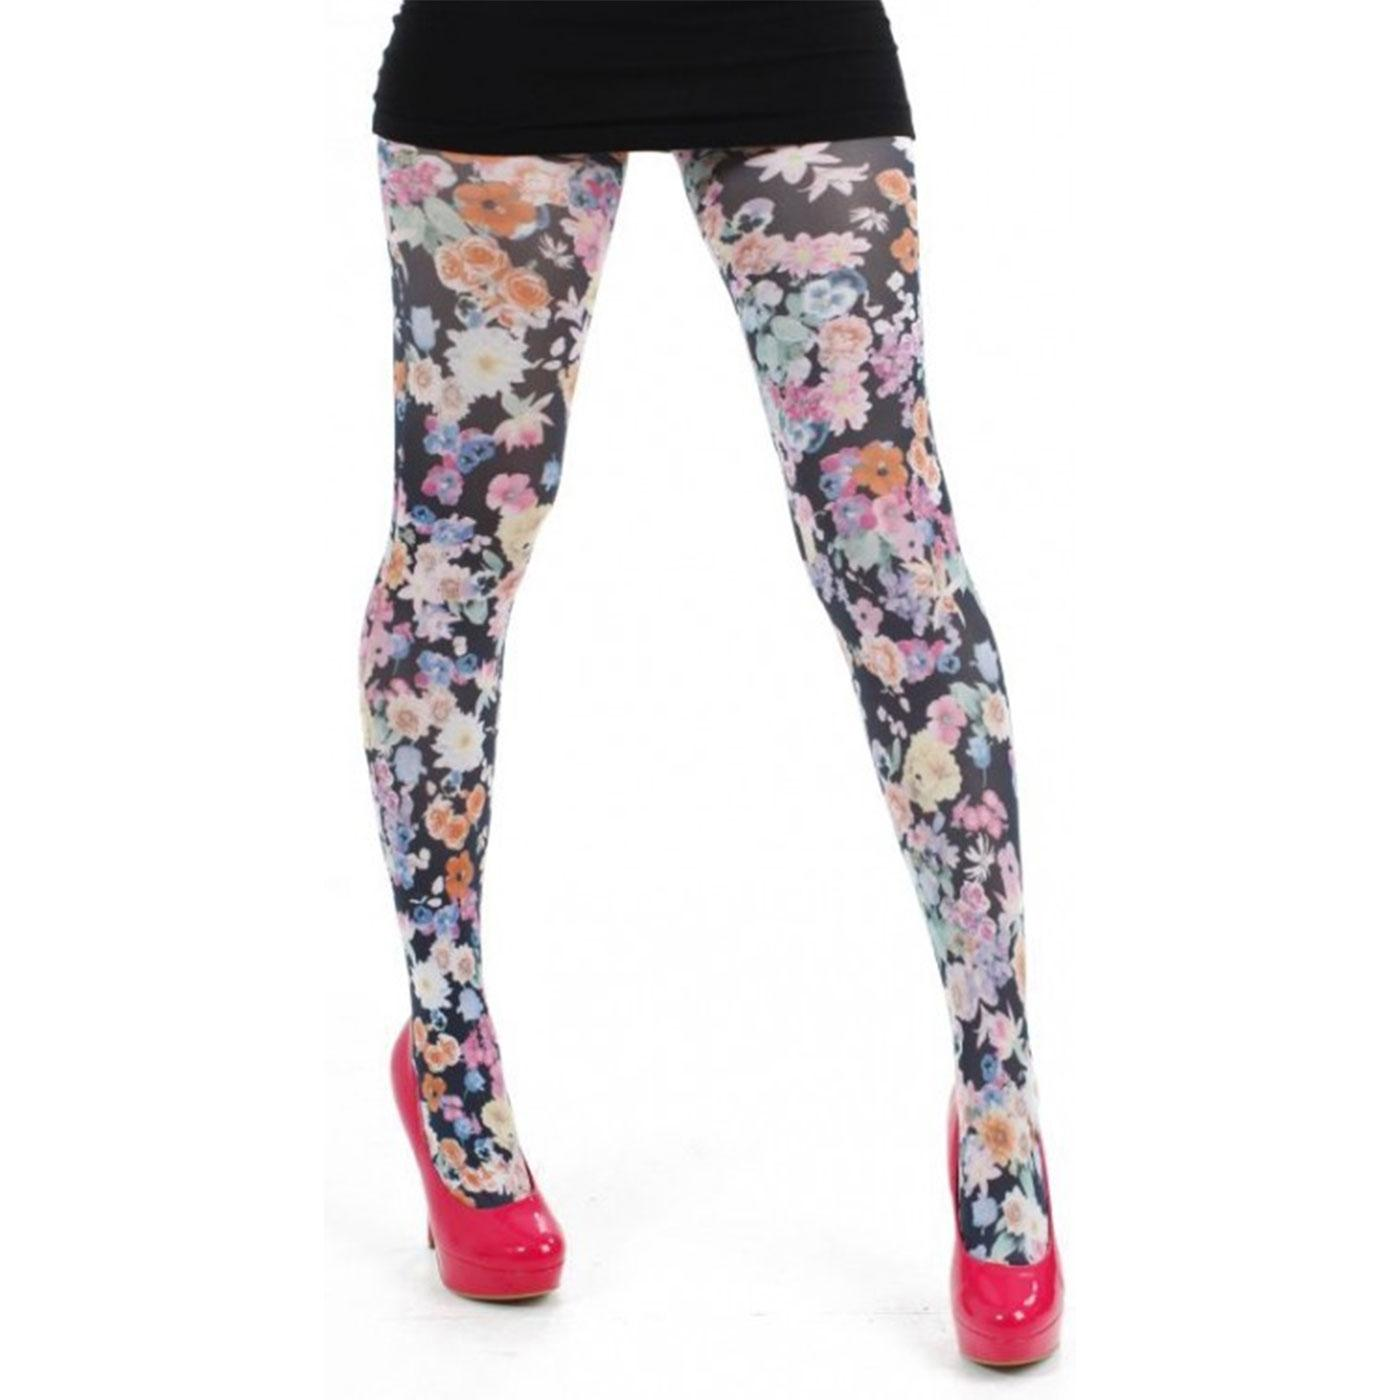 + Midnight Garden PAMELA MANN Floral Print Tights